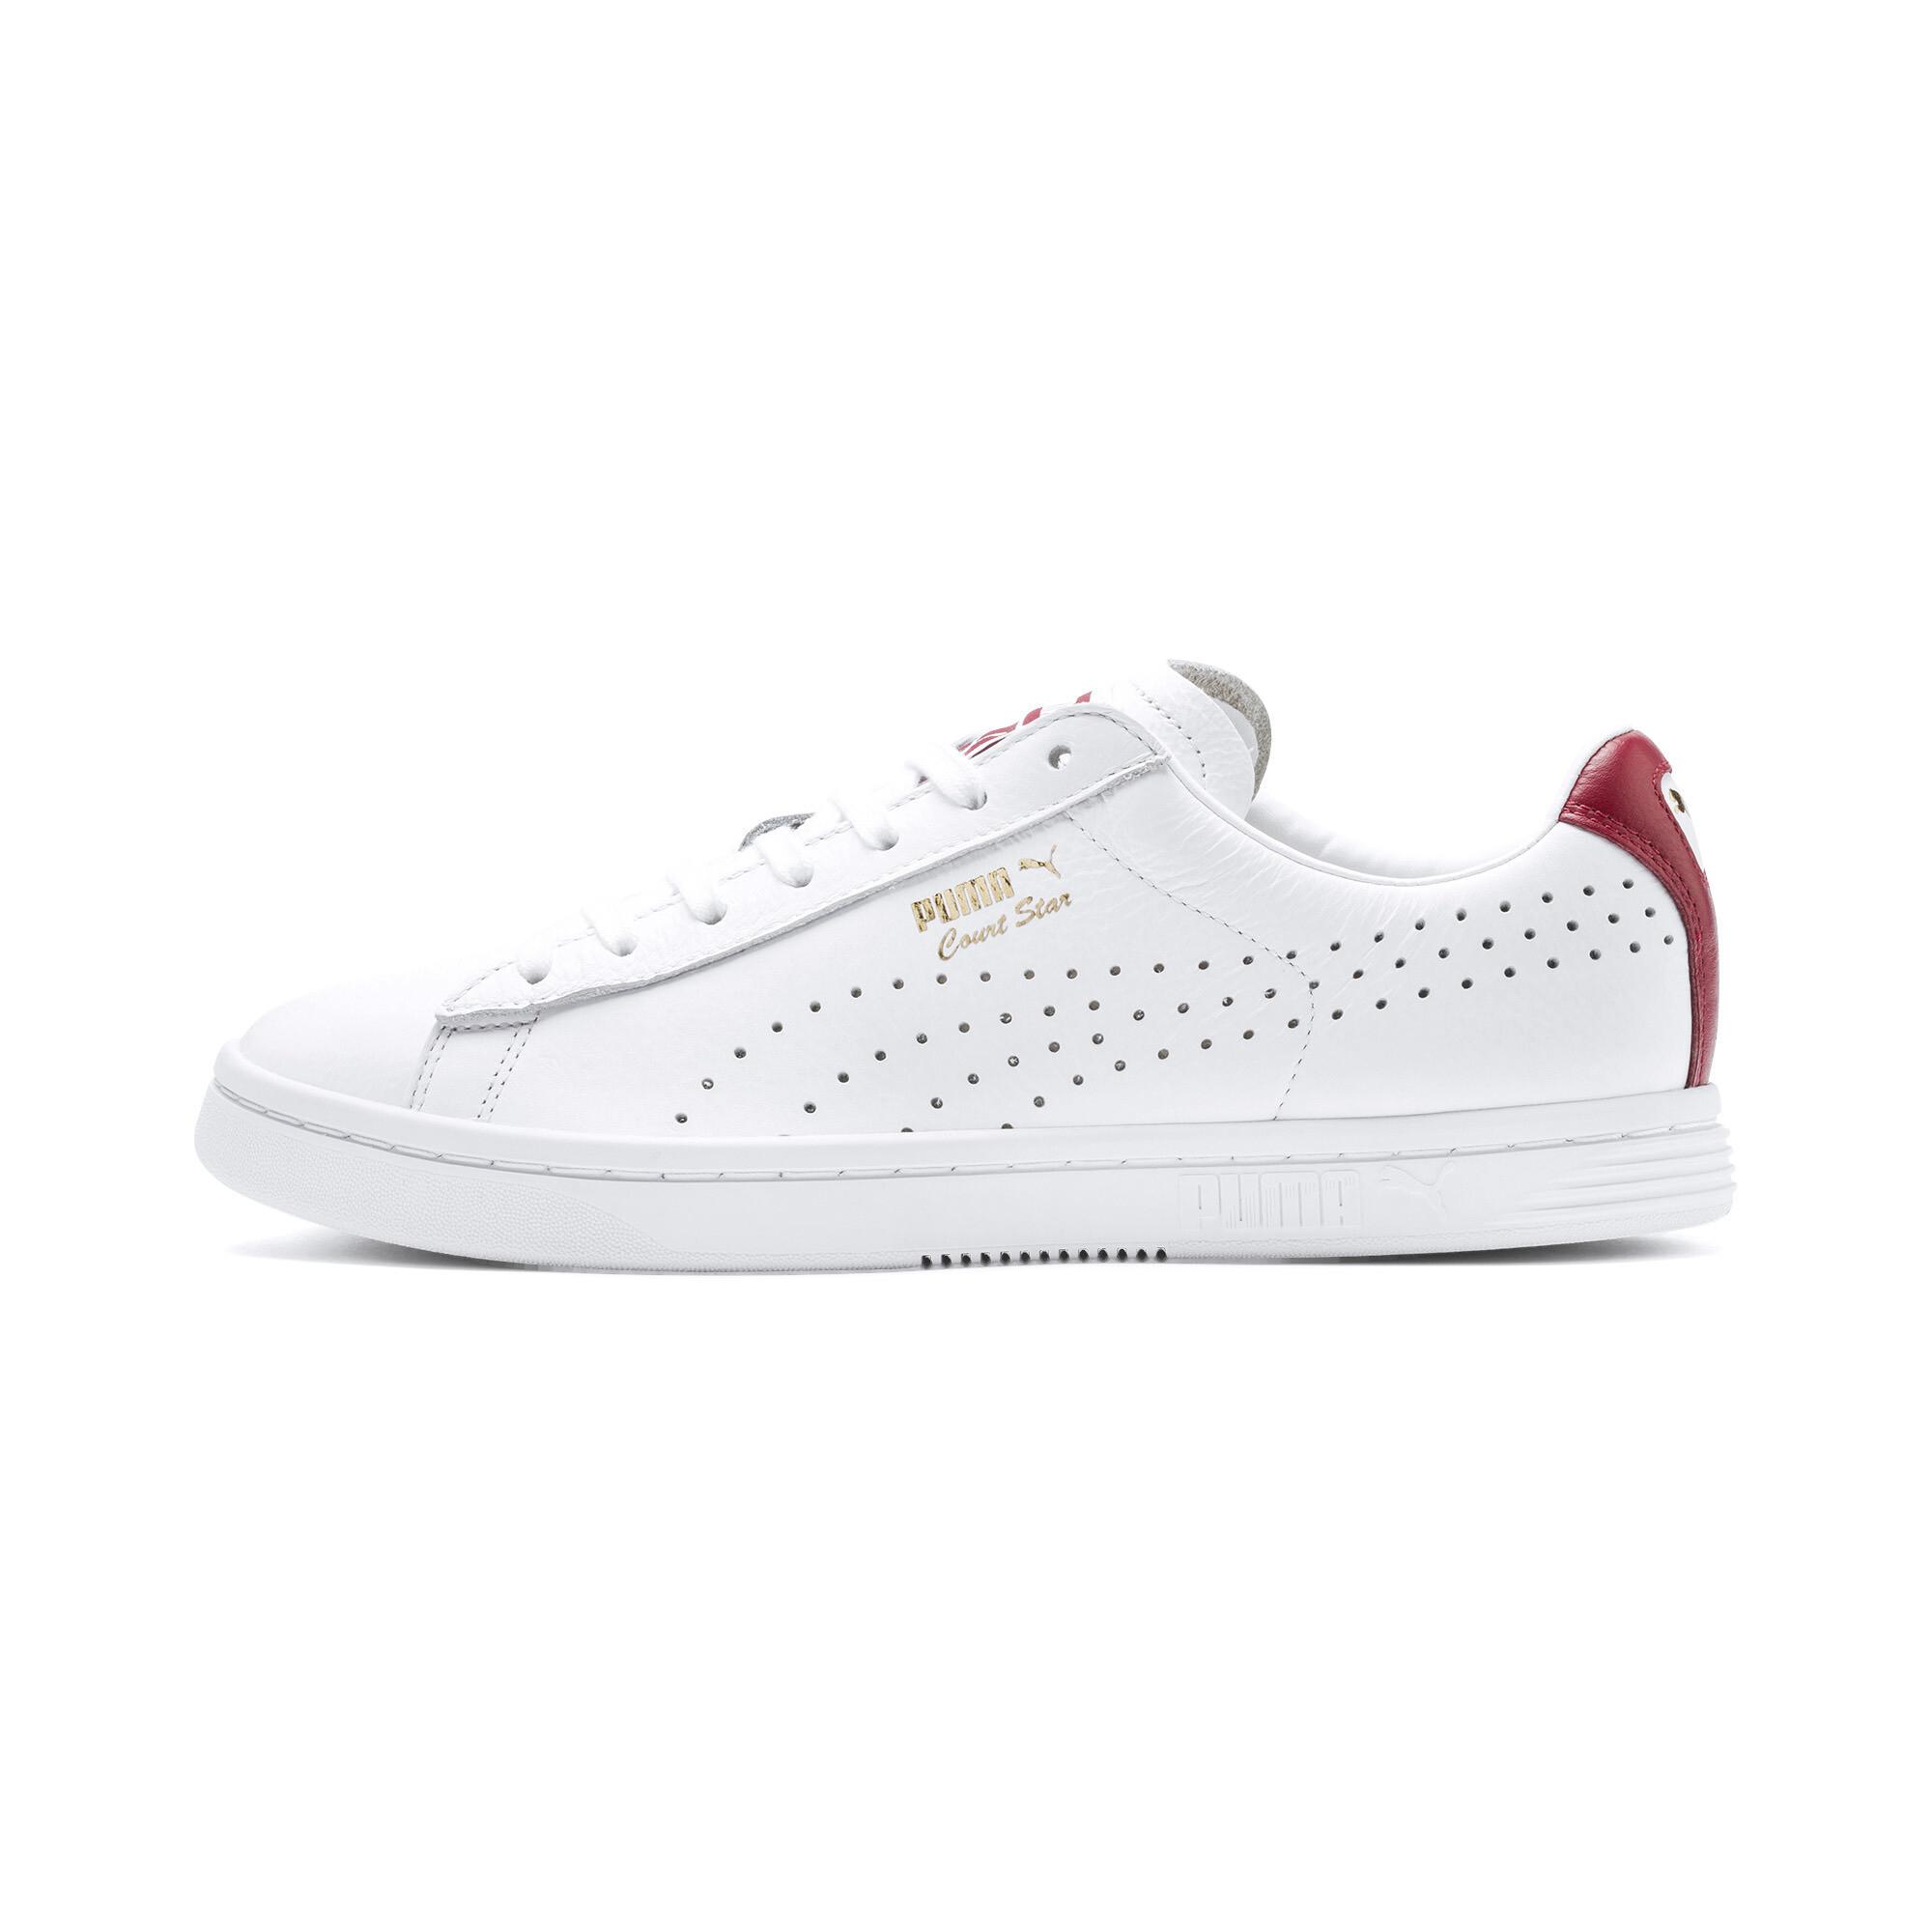 PUMA-Court-Star-Men-039-s-Sneakers-Unisex-Shoe-Sport-Classics thumbnail 11